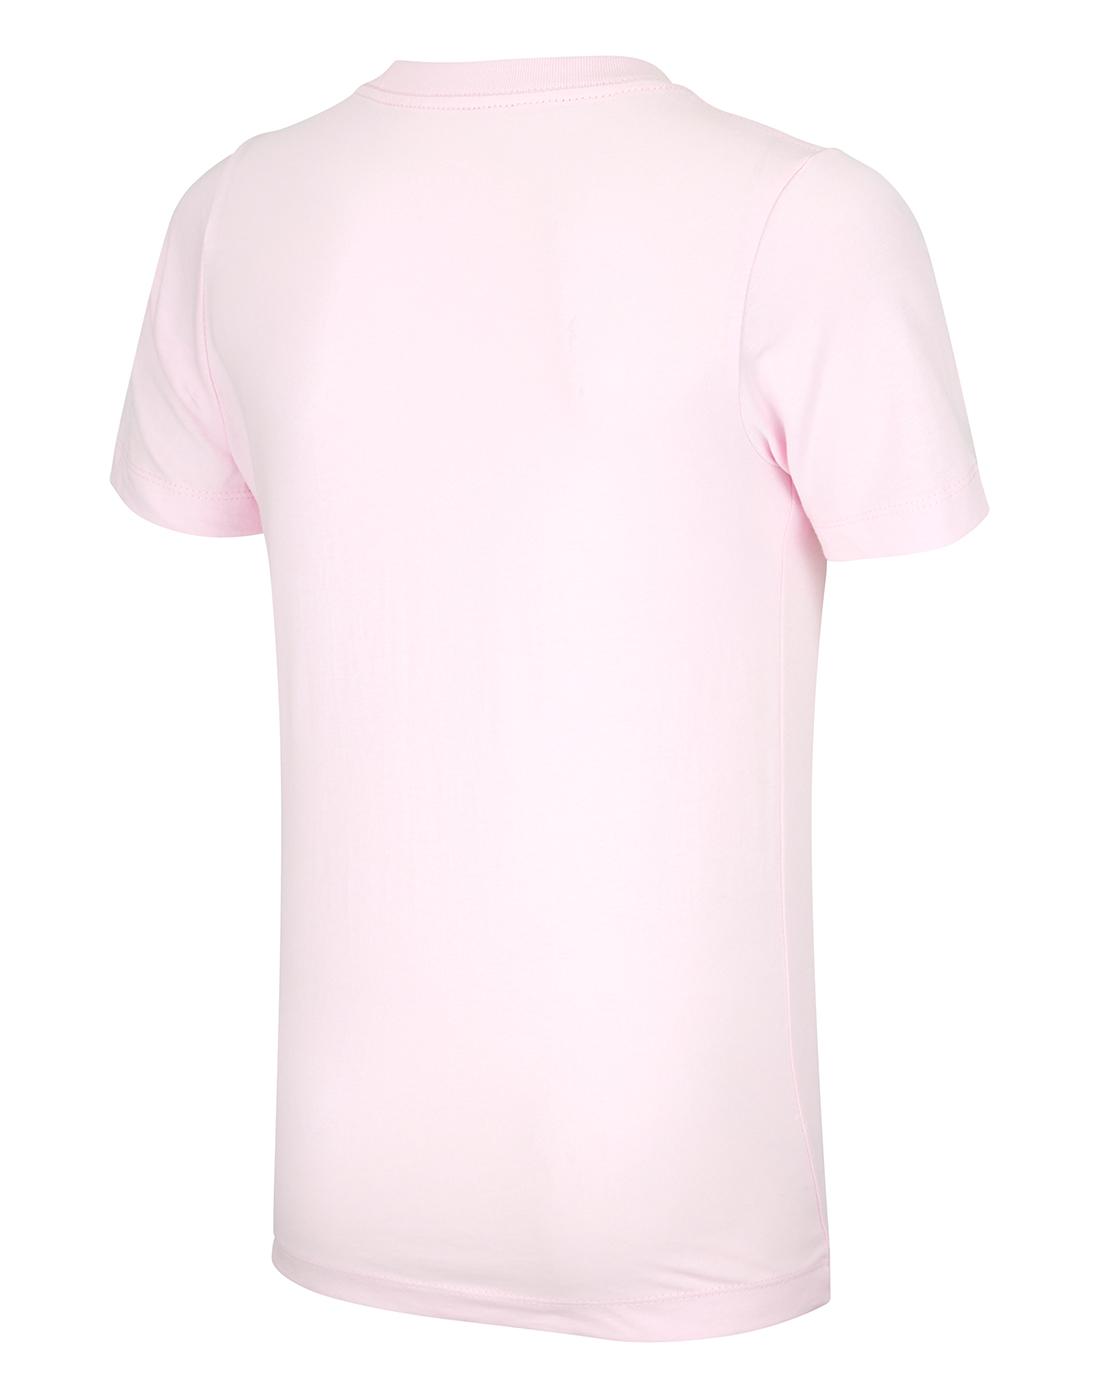 82a9bb7df Nike Older Boys JDI Swoosh T-Shirt | Life Style Sports